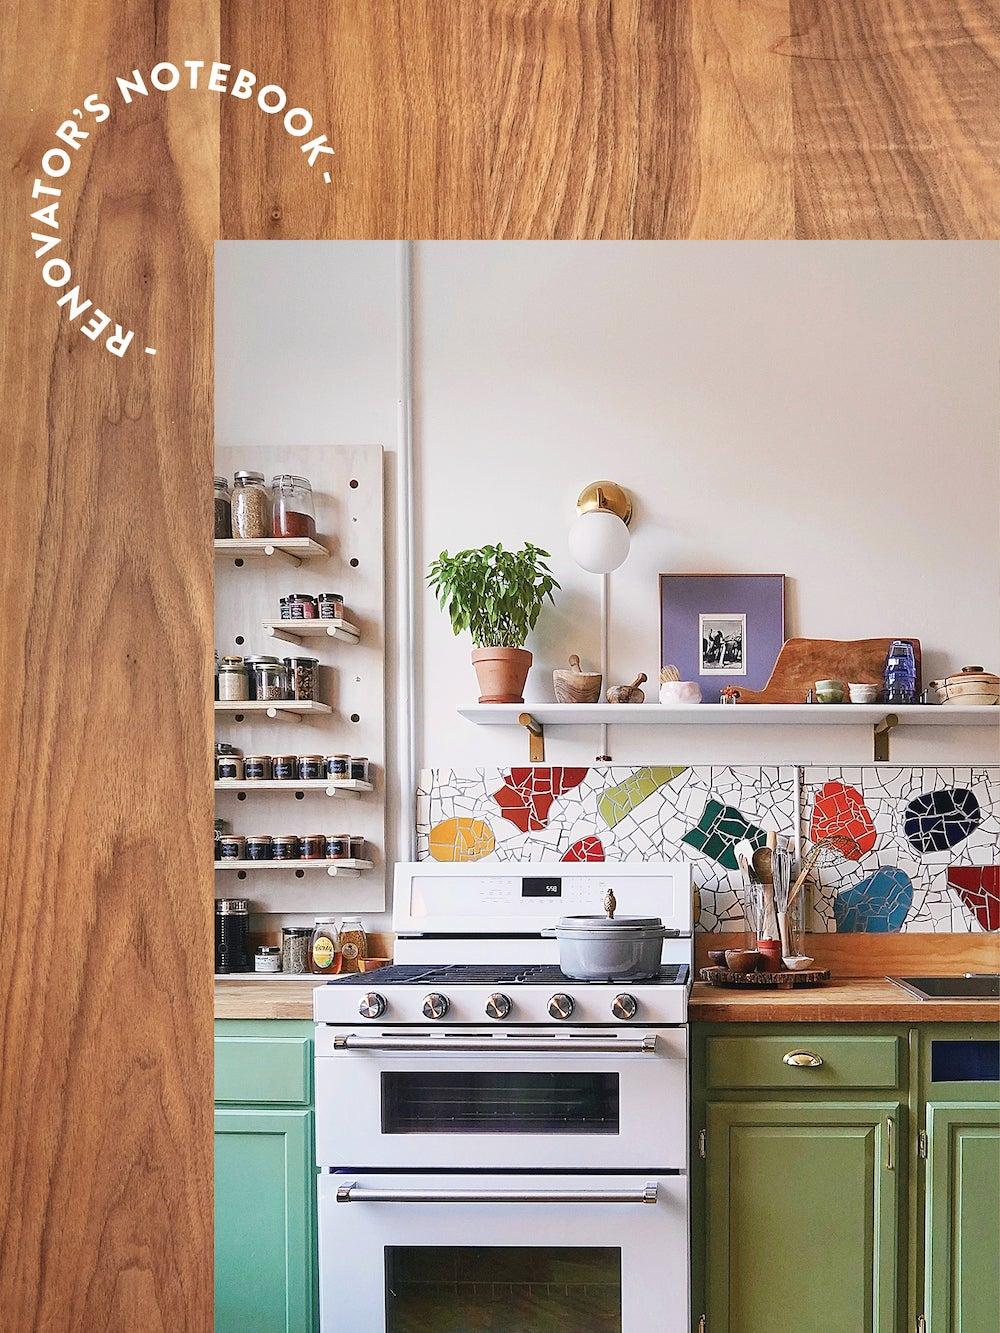 kitchen photo on wood background